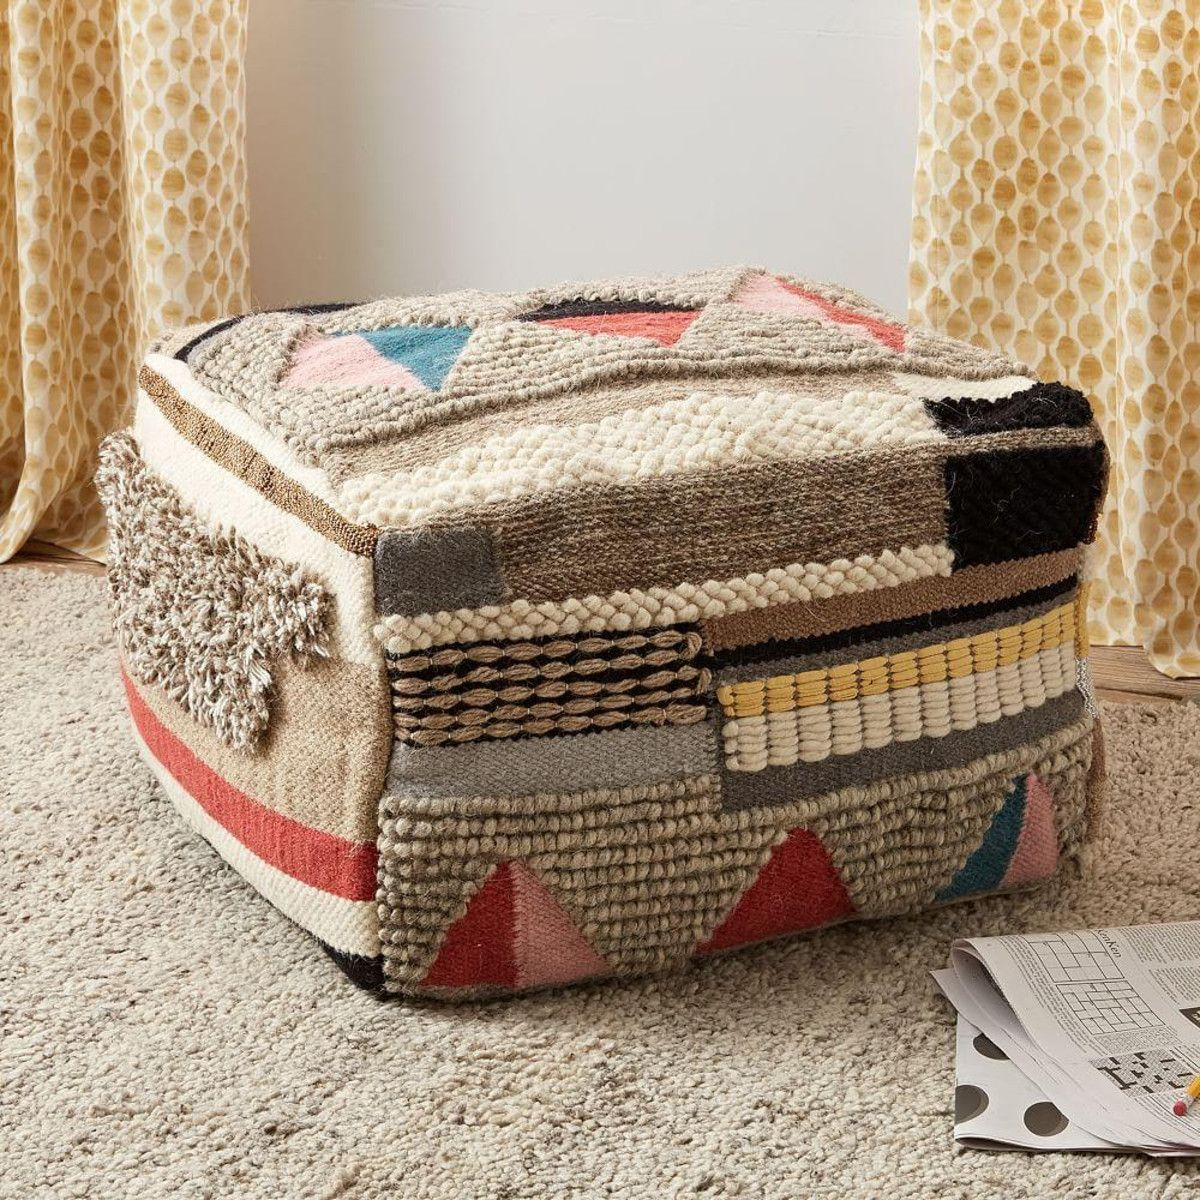 Boho Wool Pouf | WEAVESPO | Pinterest | Room ideas, Ottomans and Room